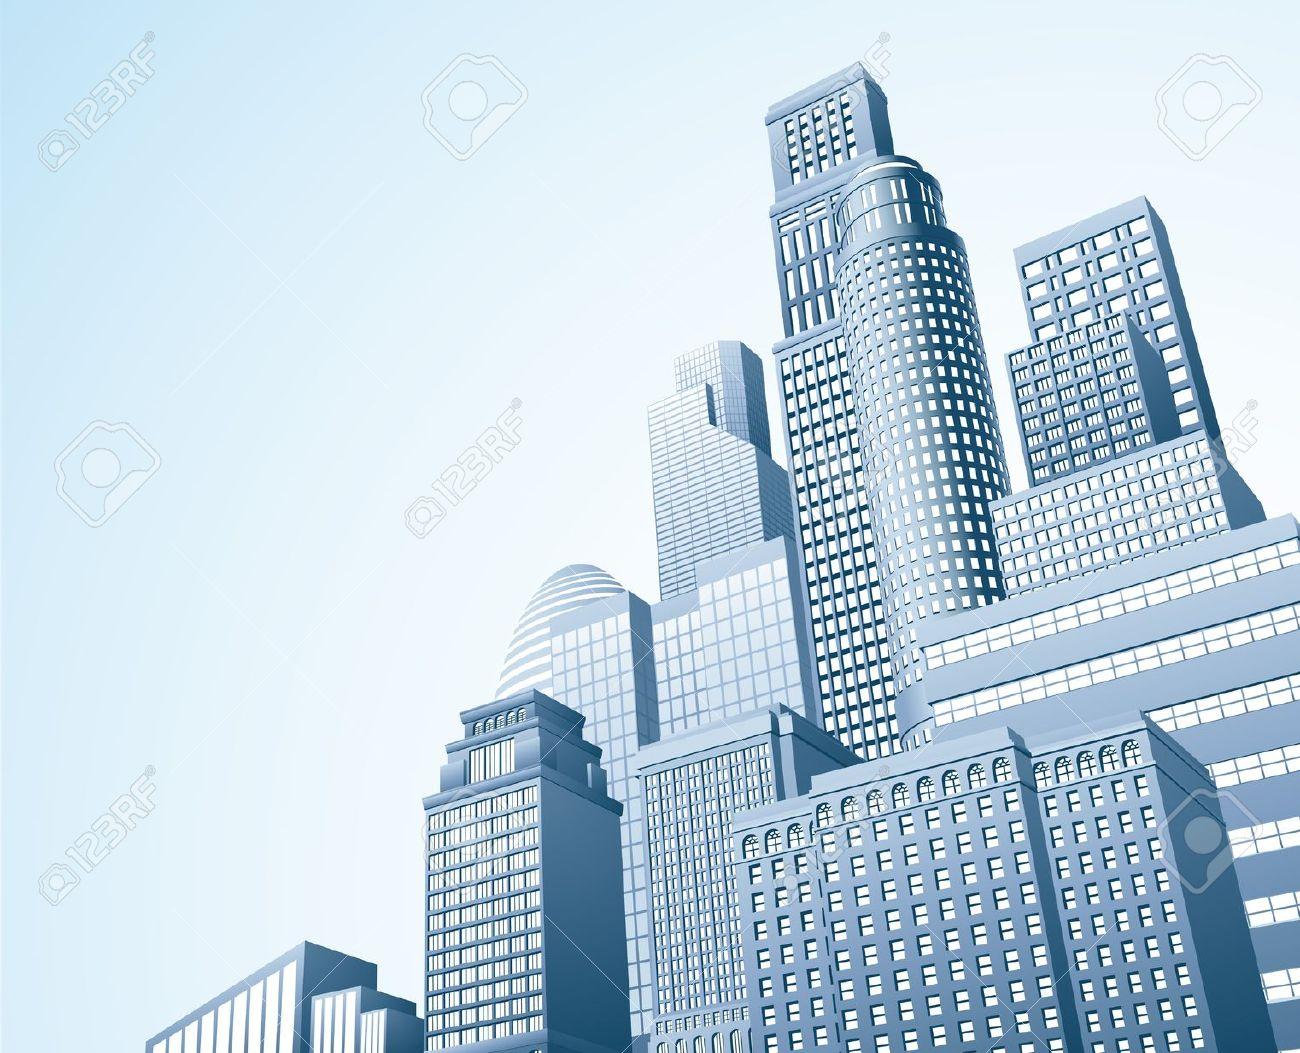 Illustration Of Urban Skyscraper Skyline Of Office Blocks Royalty.